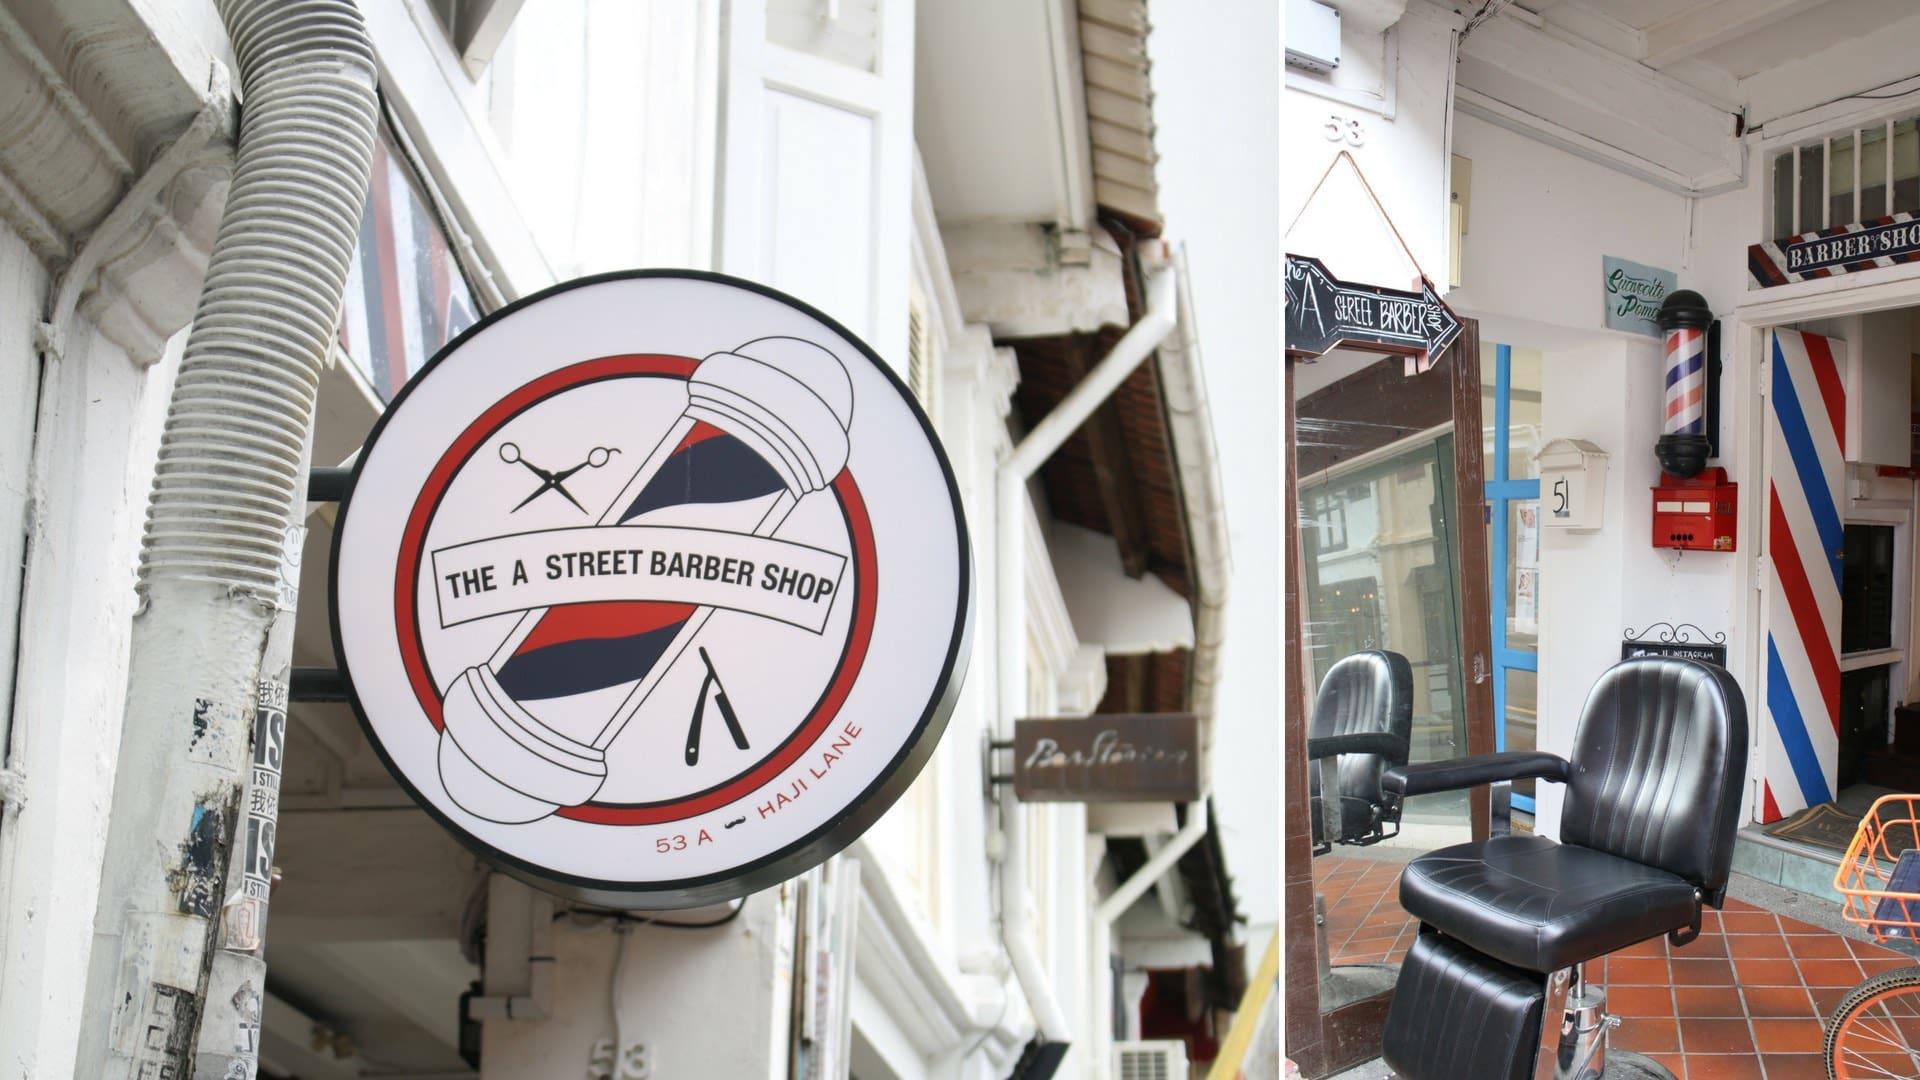 Khám phá Haji Lane: a street barber shop